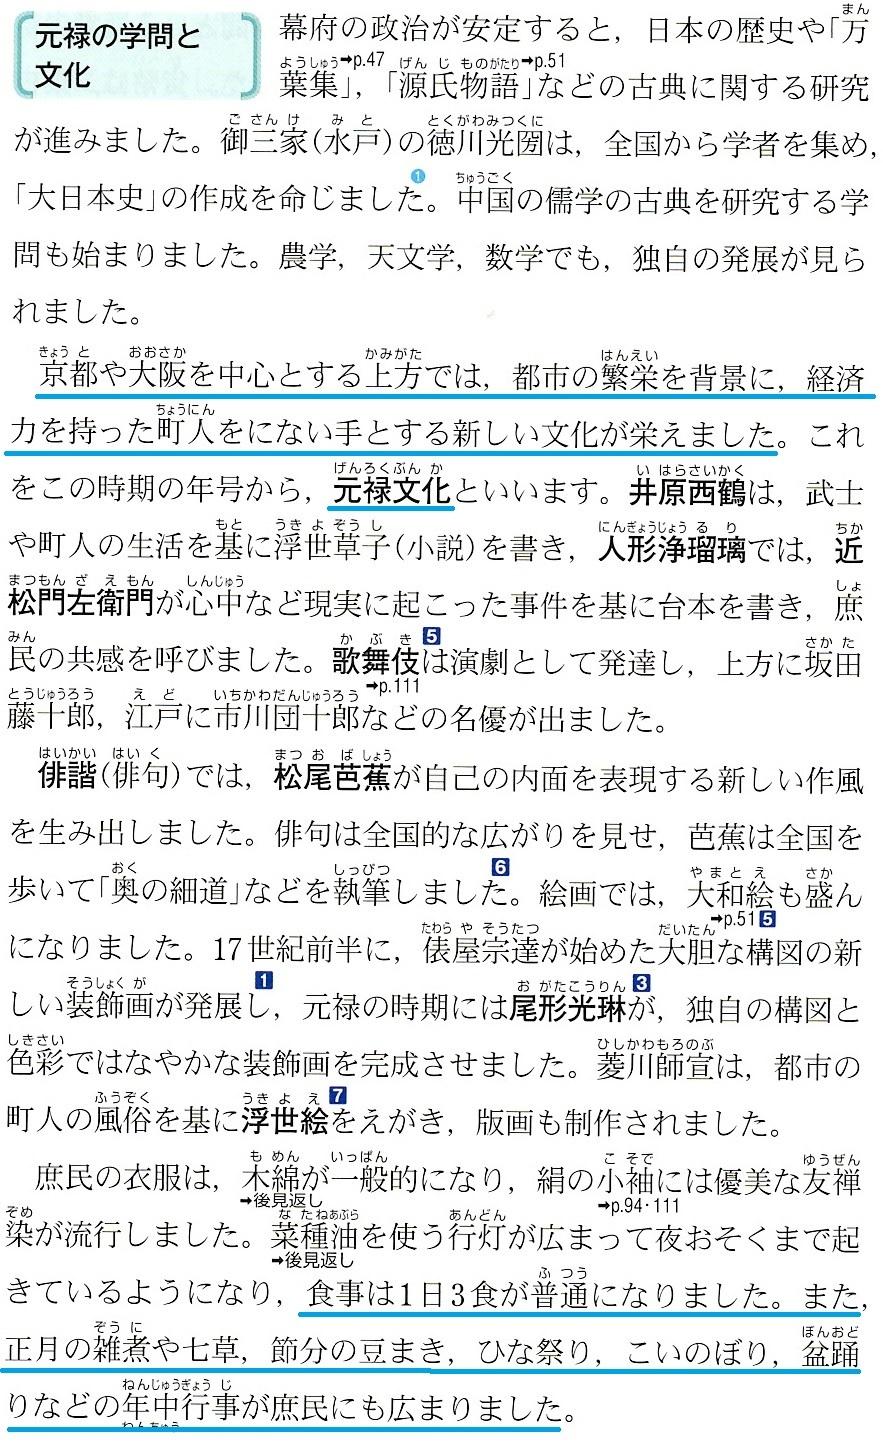 東京書籍 幕府政治の安定と元禄文化 3